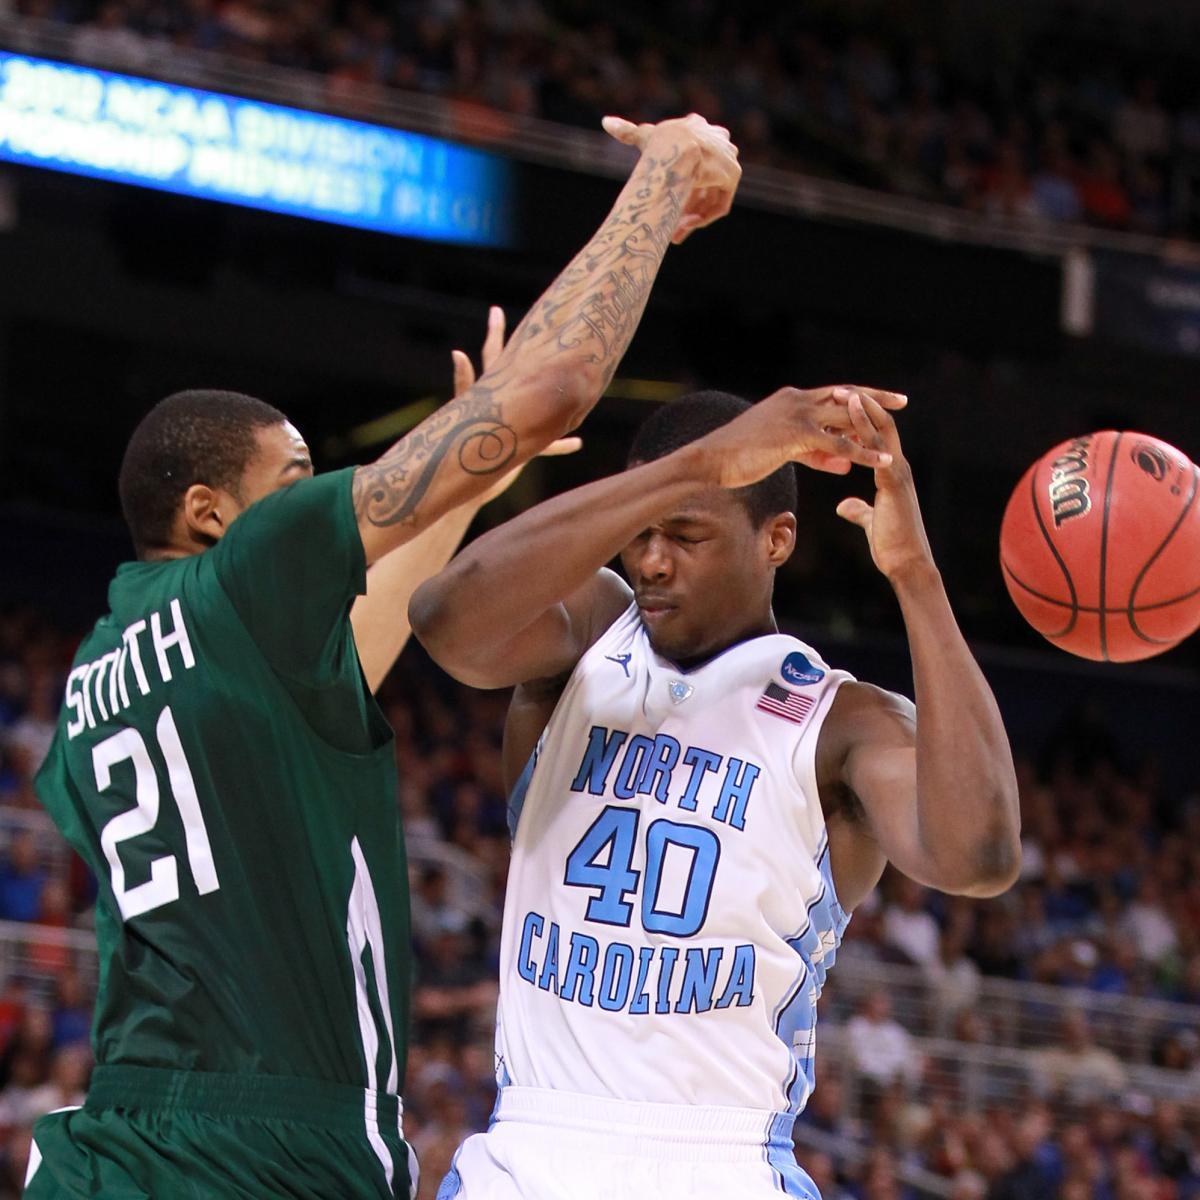 Harrison Barnes Nba: NBA Draft 2012: Harrison Barnes Selected By Golden State